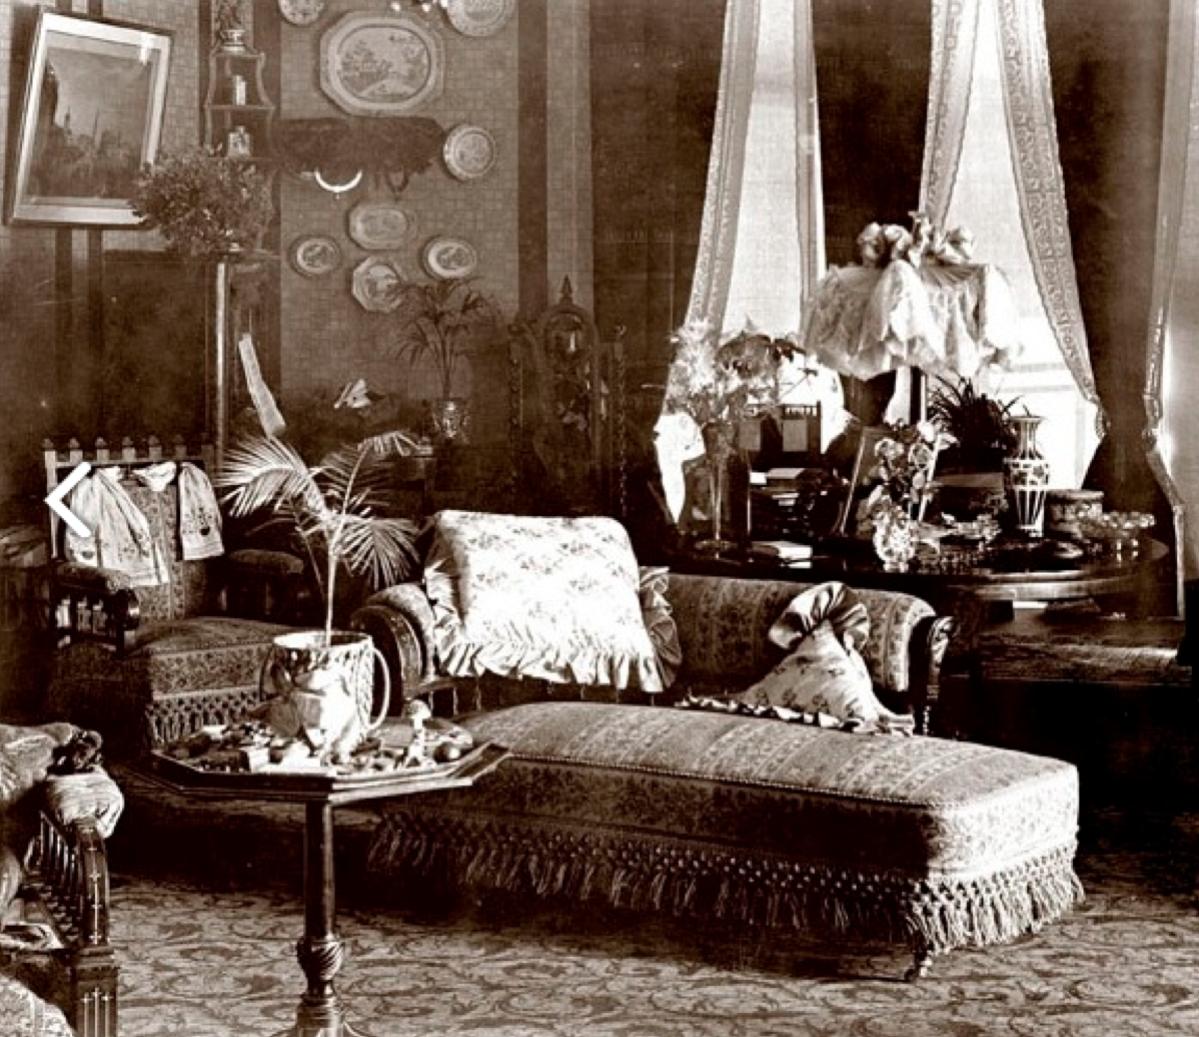 Victorian interiores decoraci n victoriana victoriano for Decoracion de casas victorianas